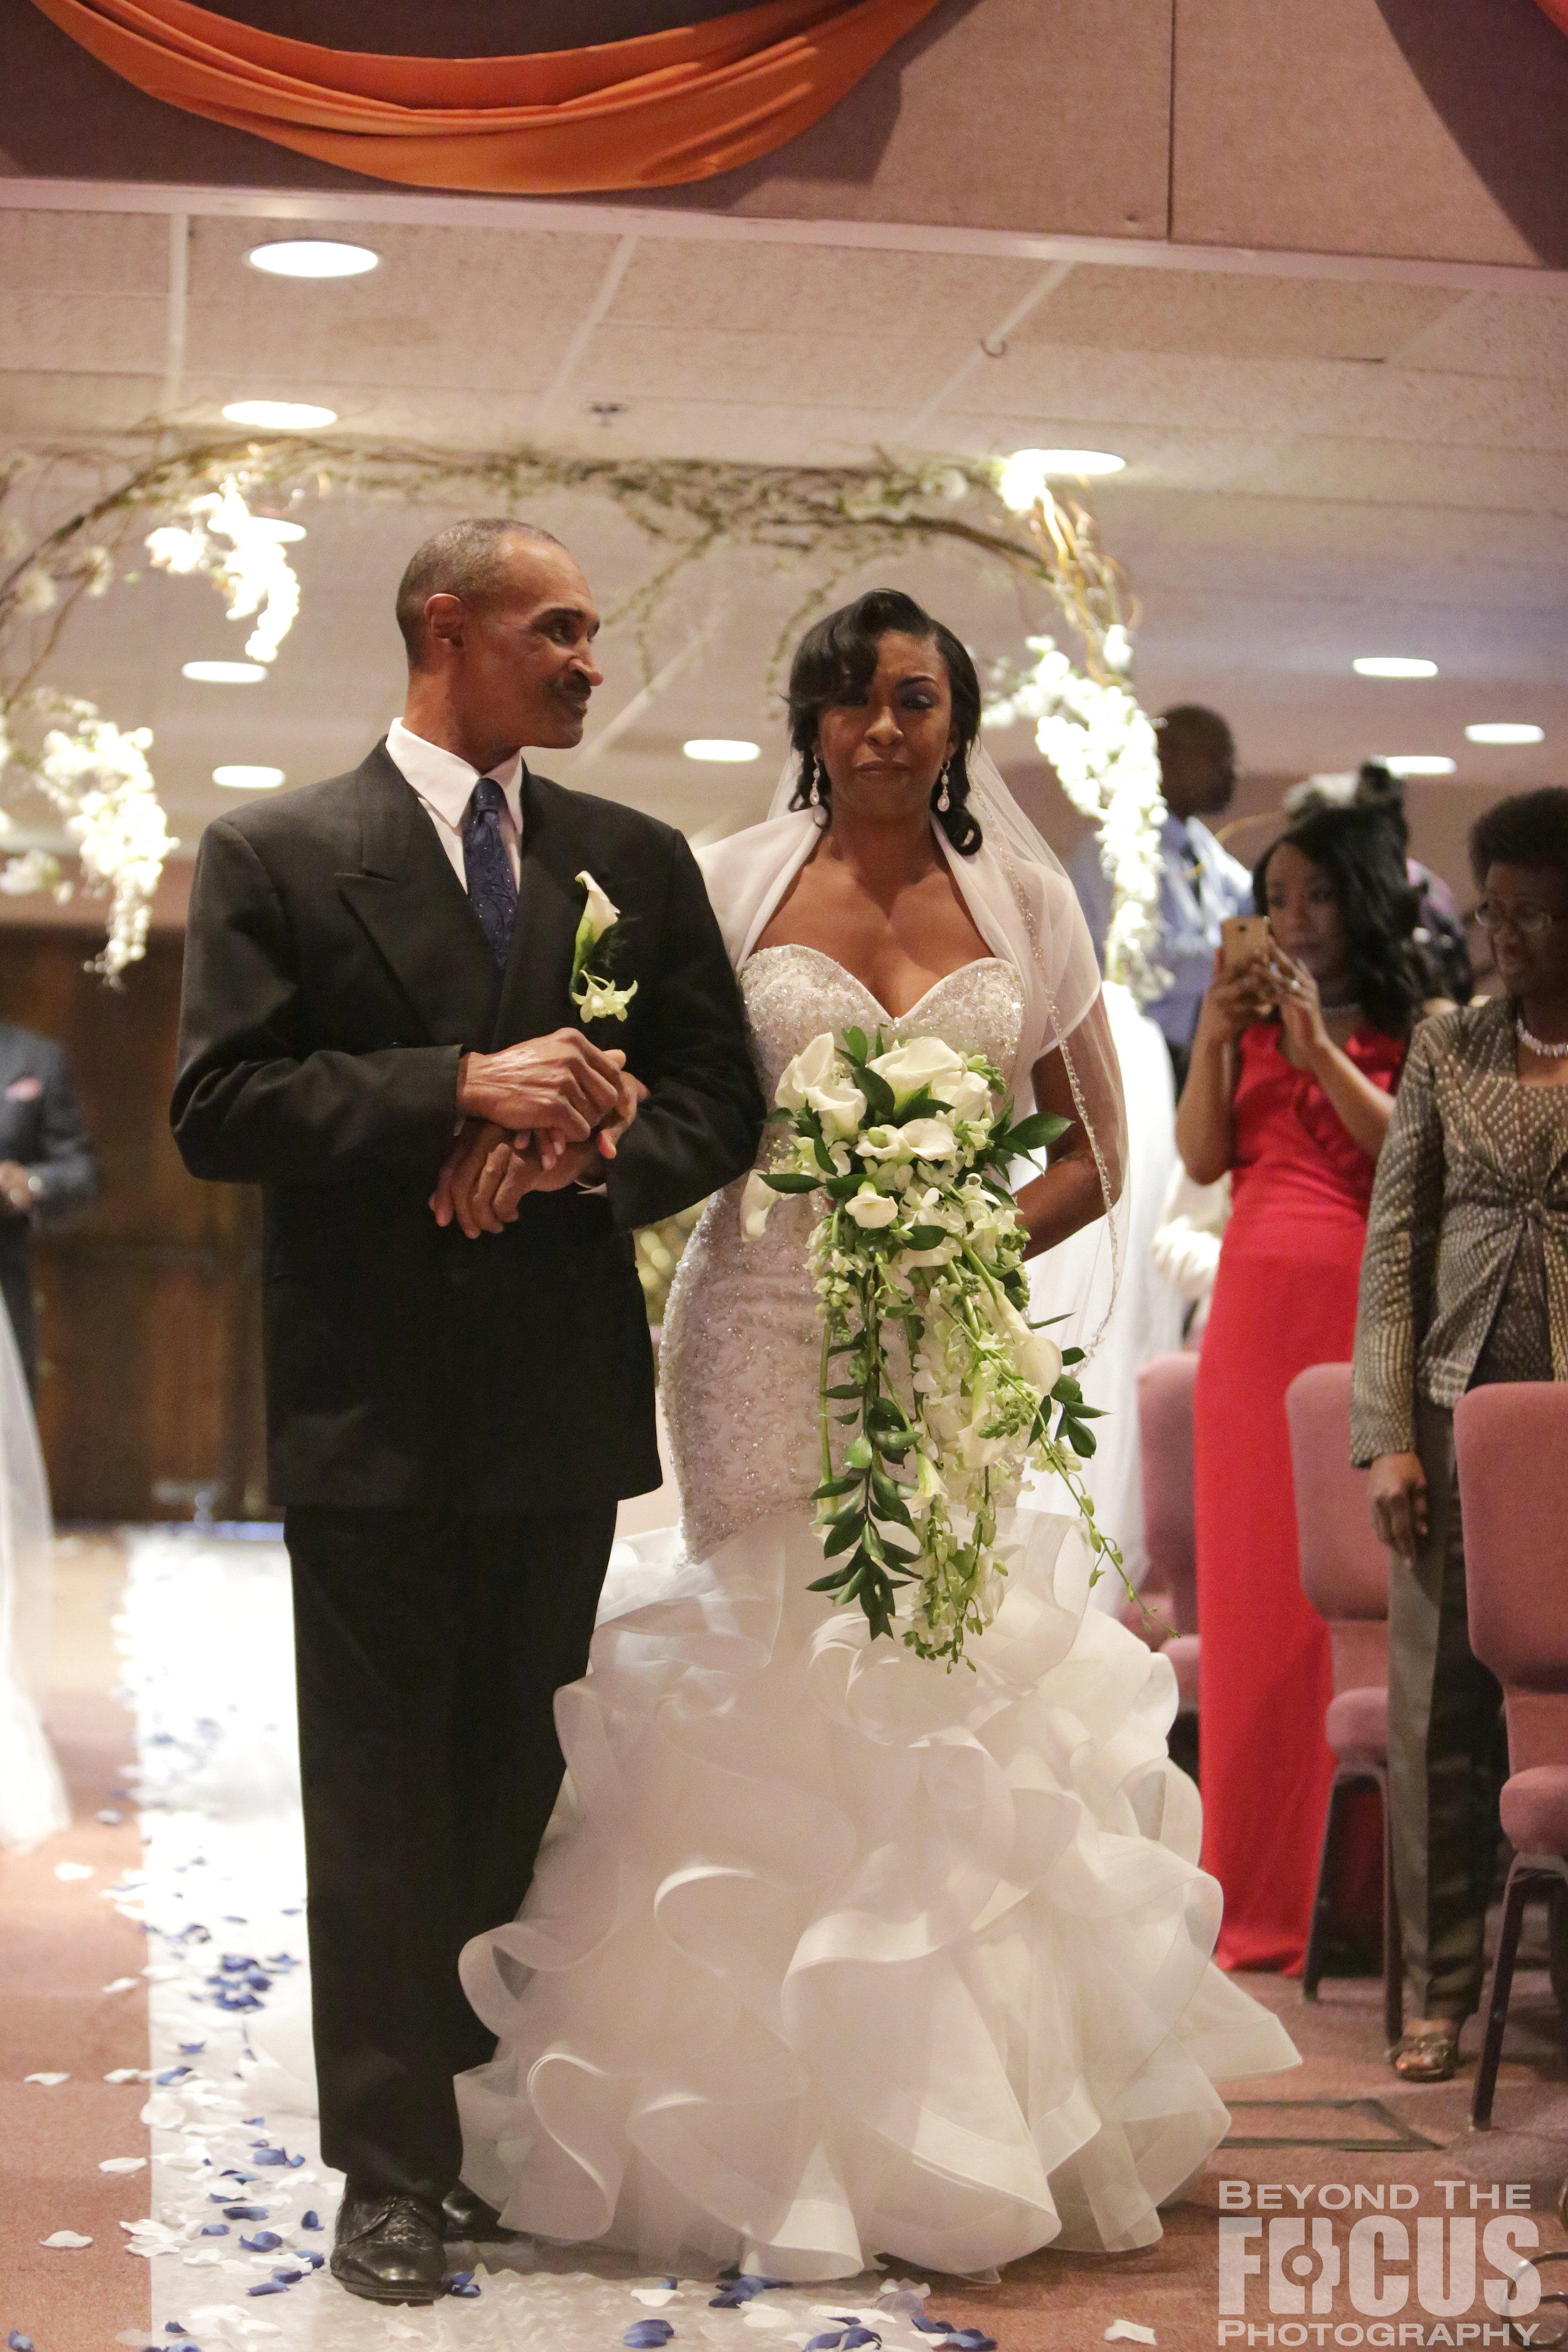 Matthews_Wedding_Ceremony_41.jpg